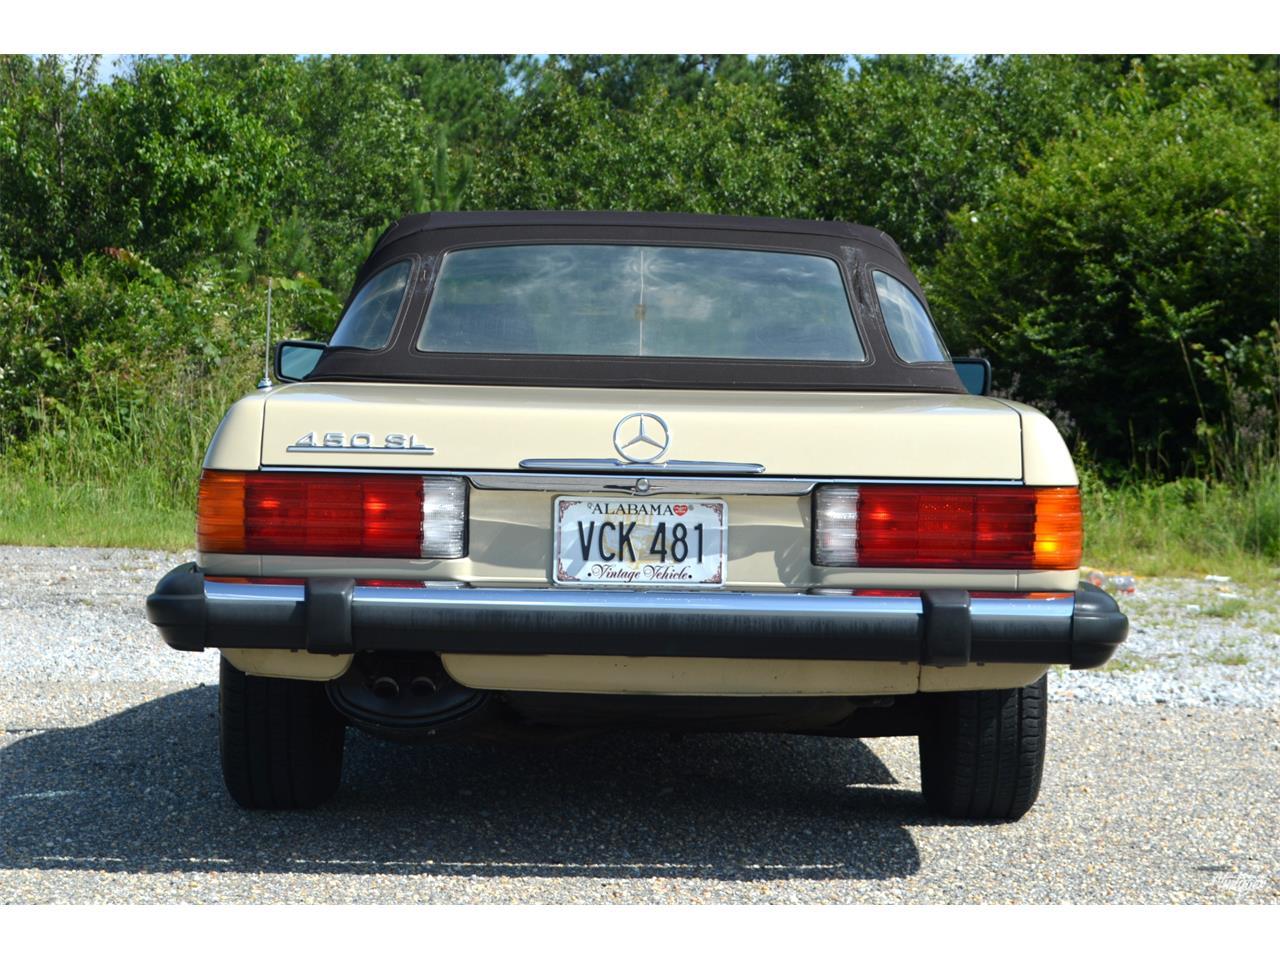 Large Picture of '80 Mercedes-Benz 450SL located in Alabama - LEDI